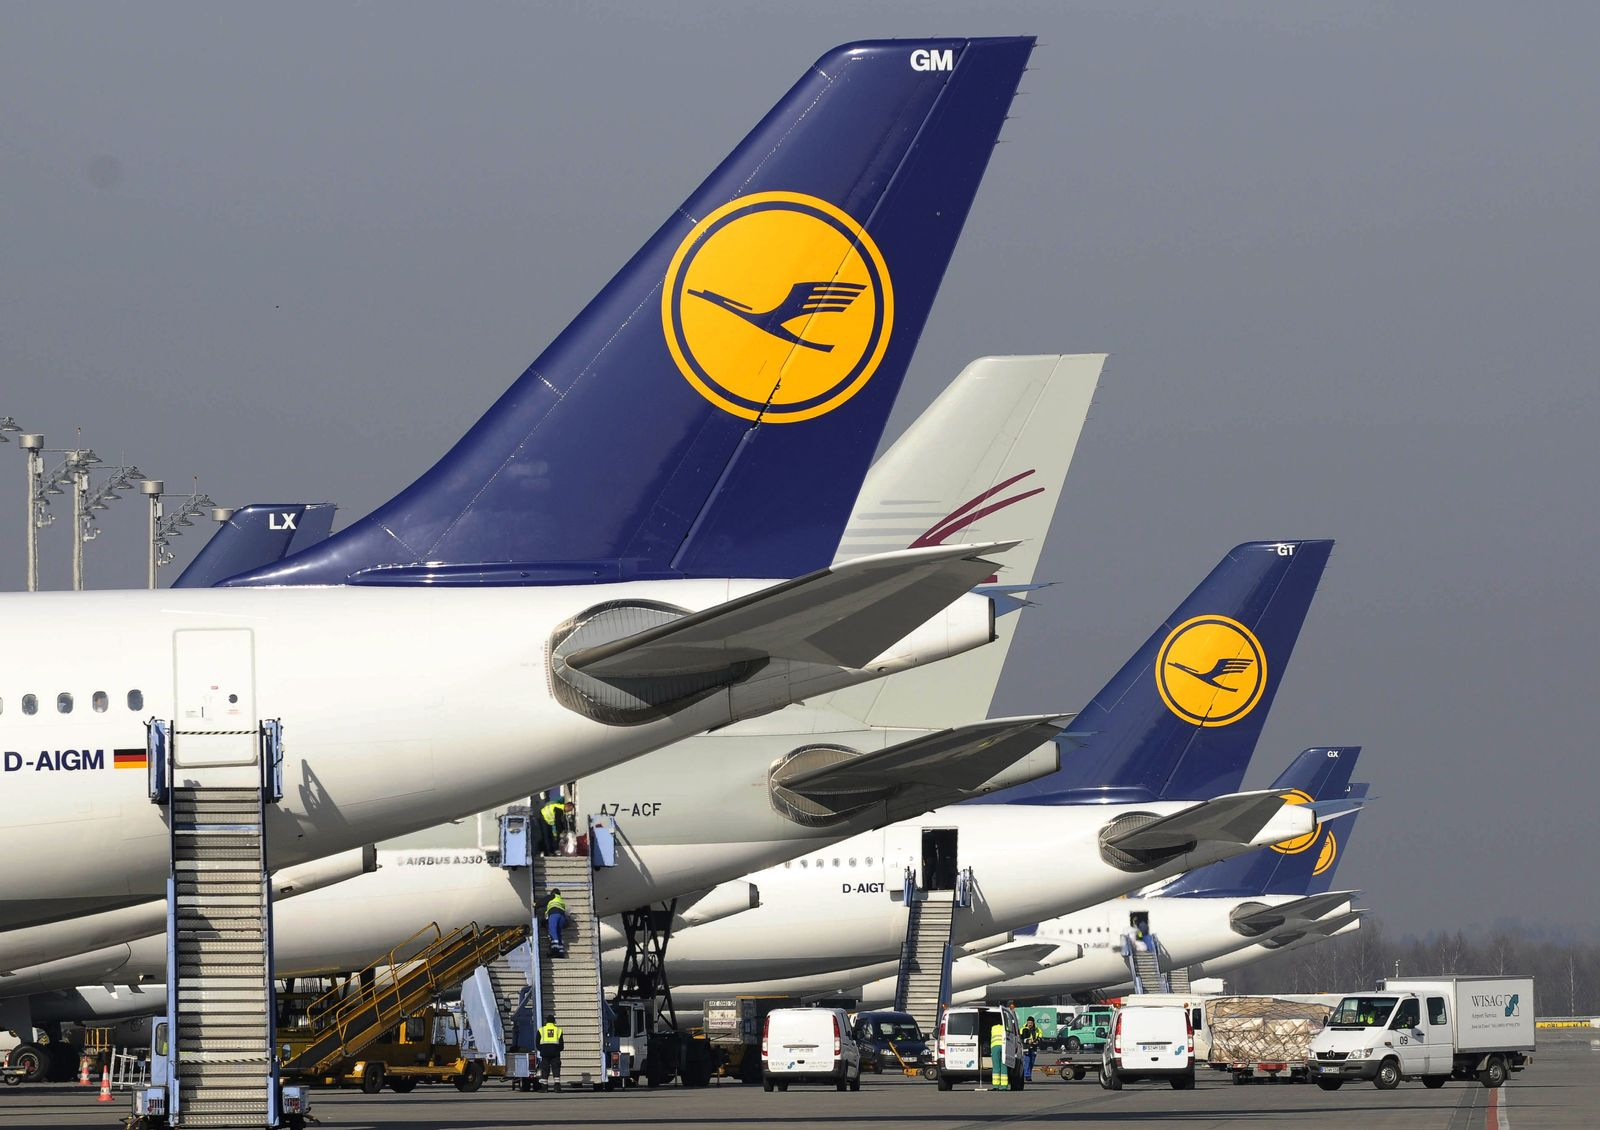 Bodenpersonal / Lufthansa / Rollfeld